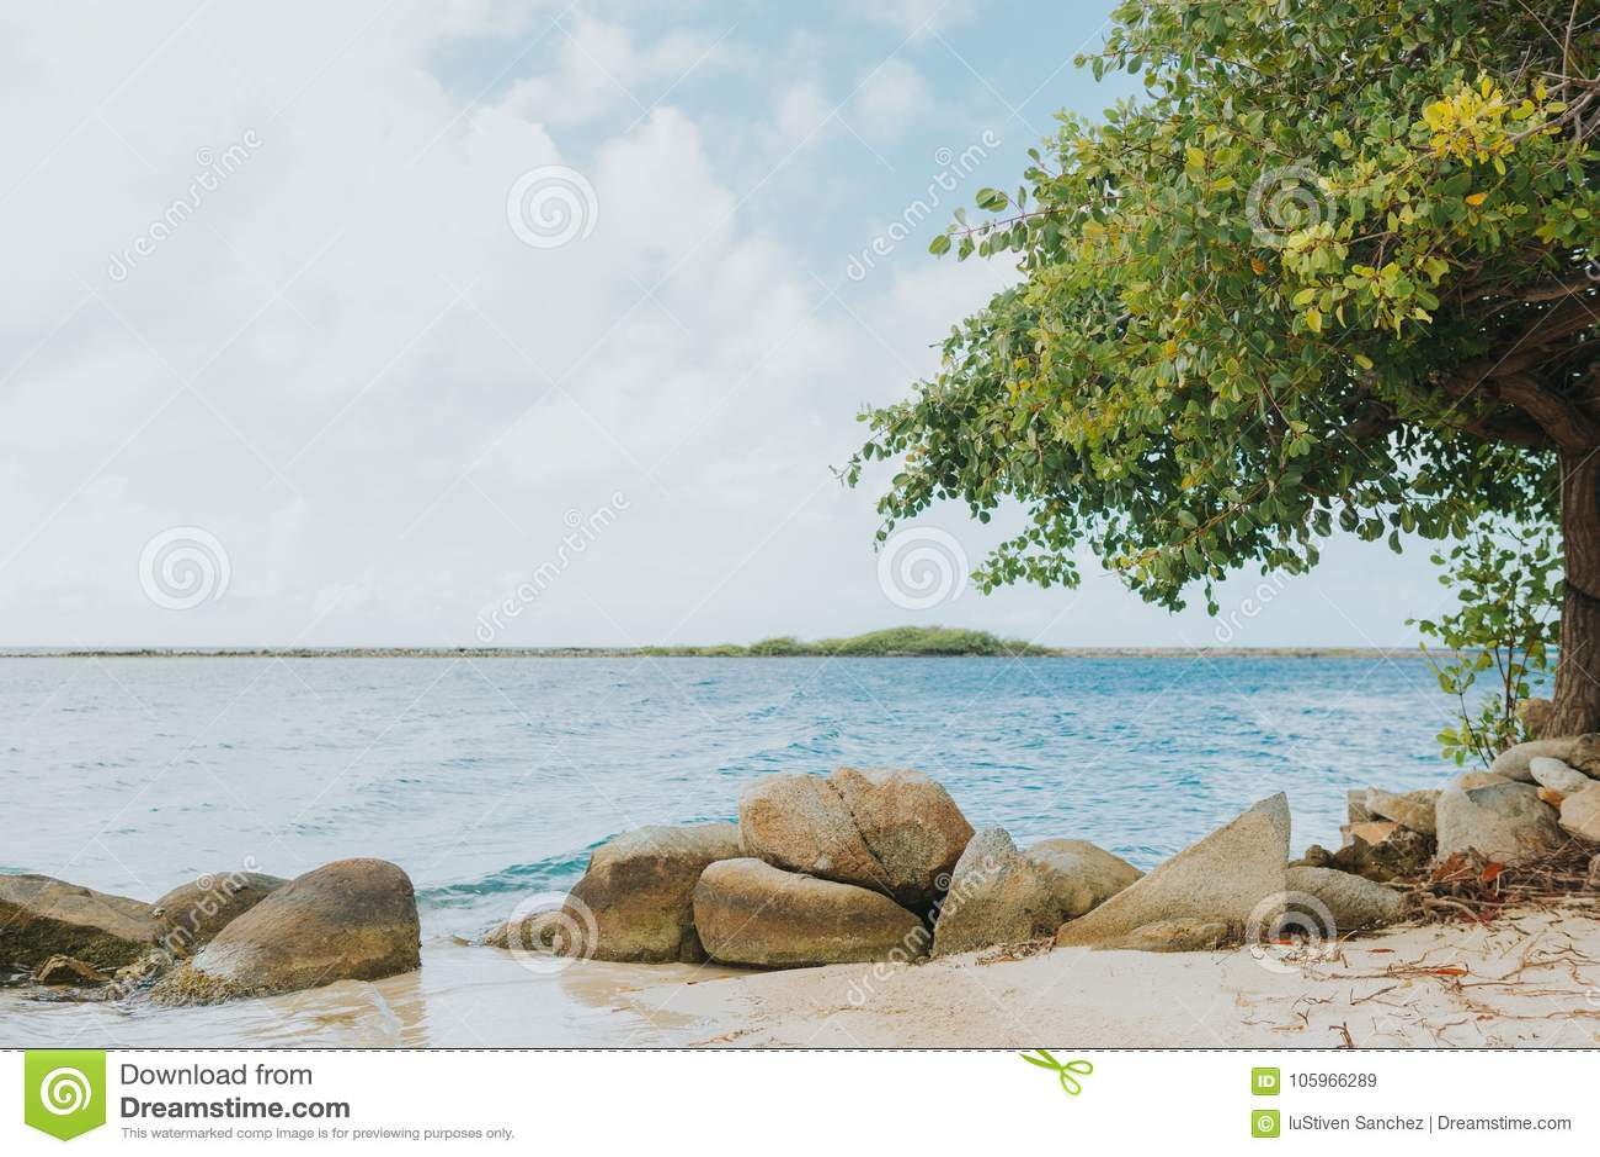 Caribbean Relaxation: Aruba Beach Tropical Island Savaneta Stock Image